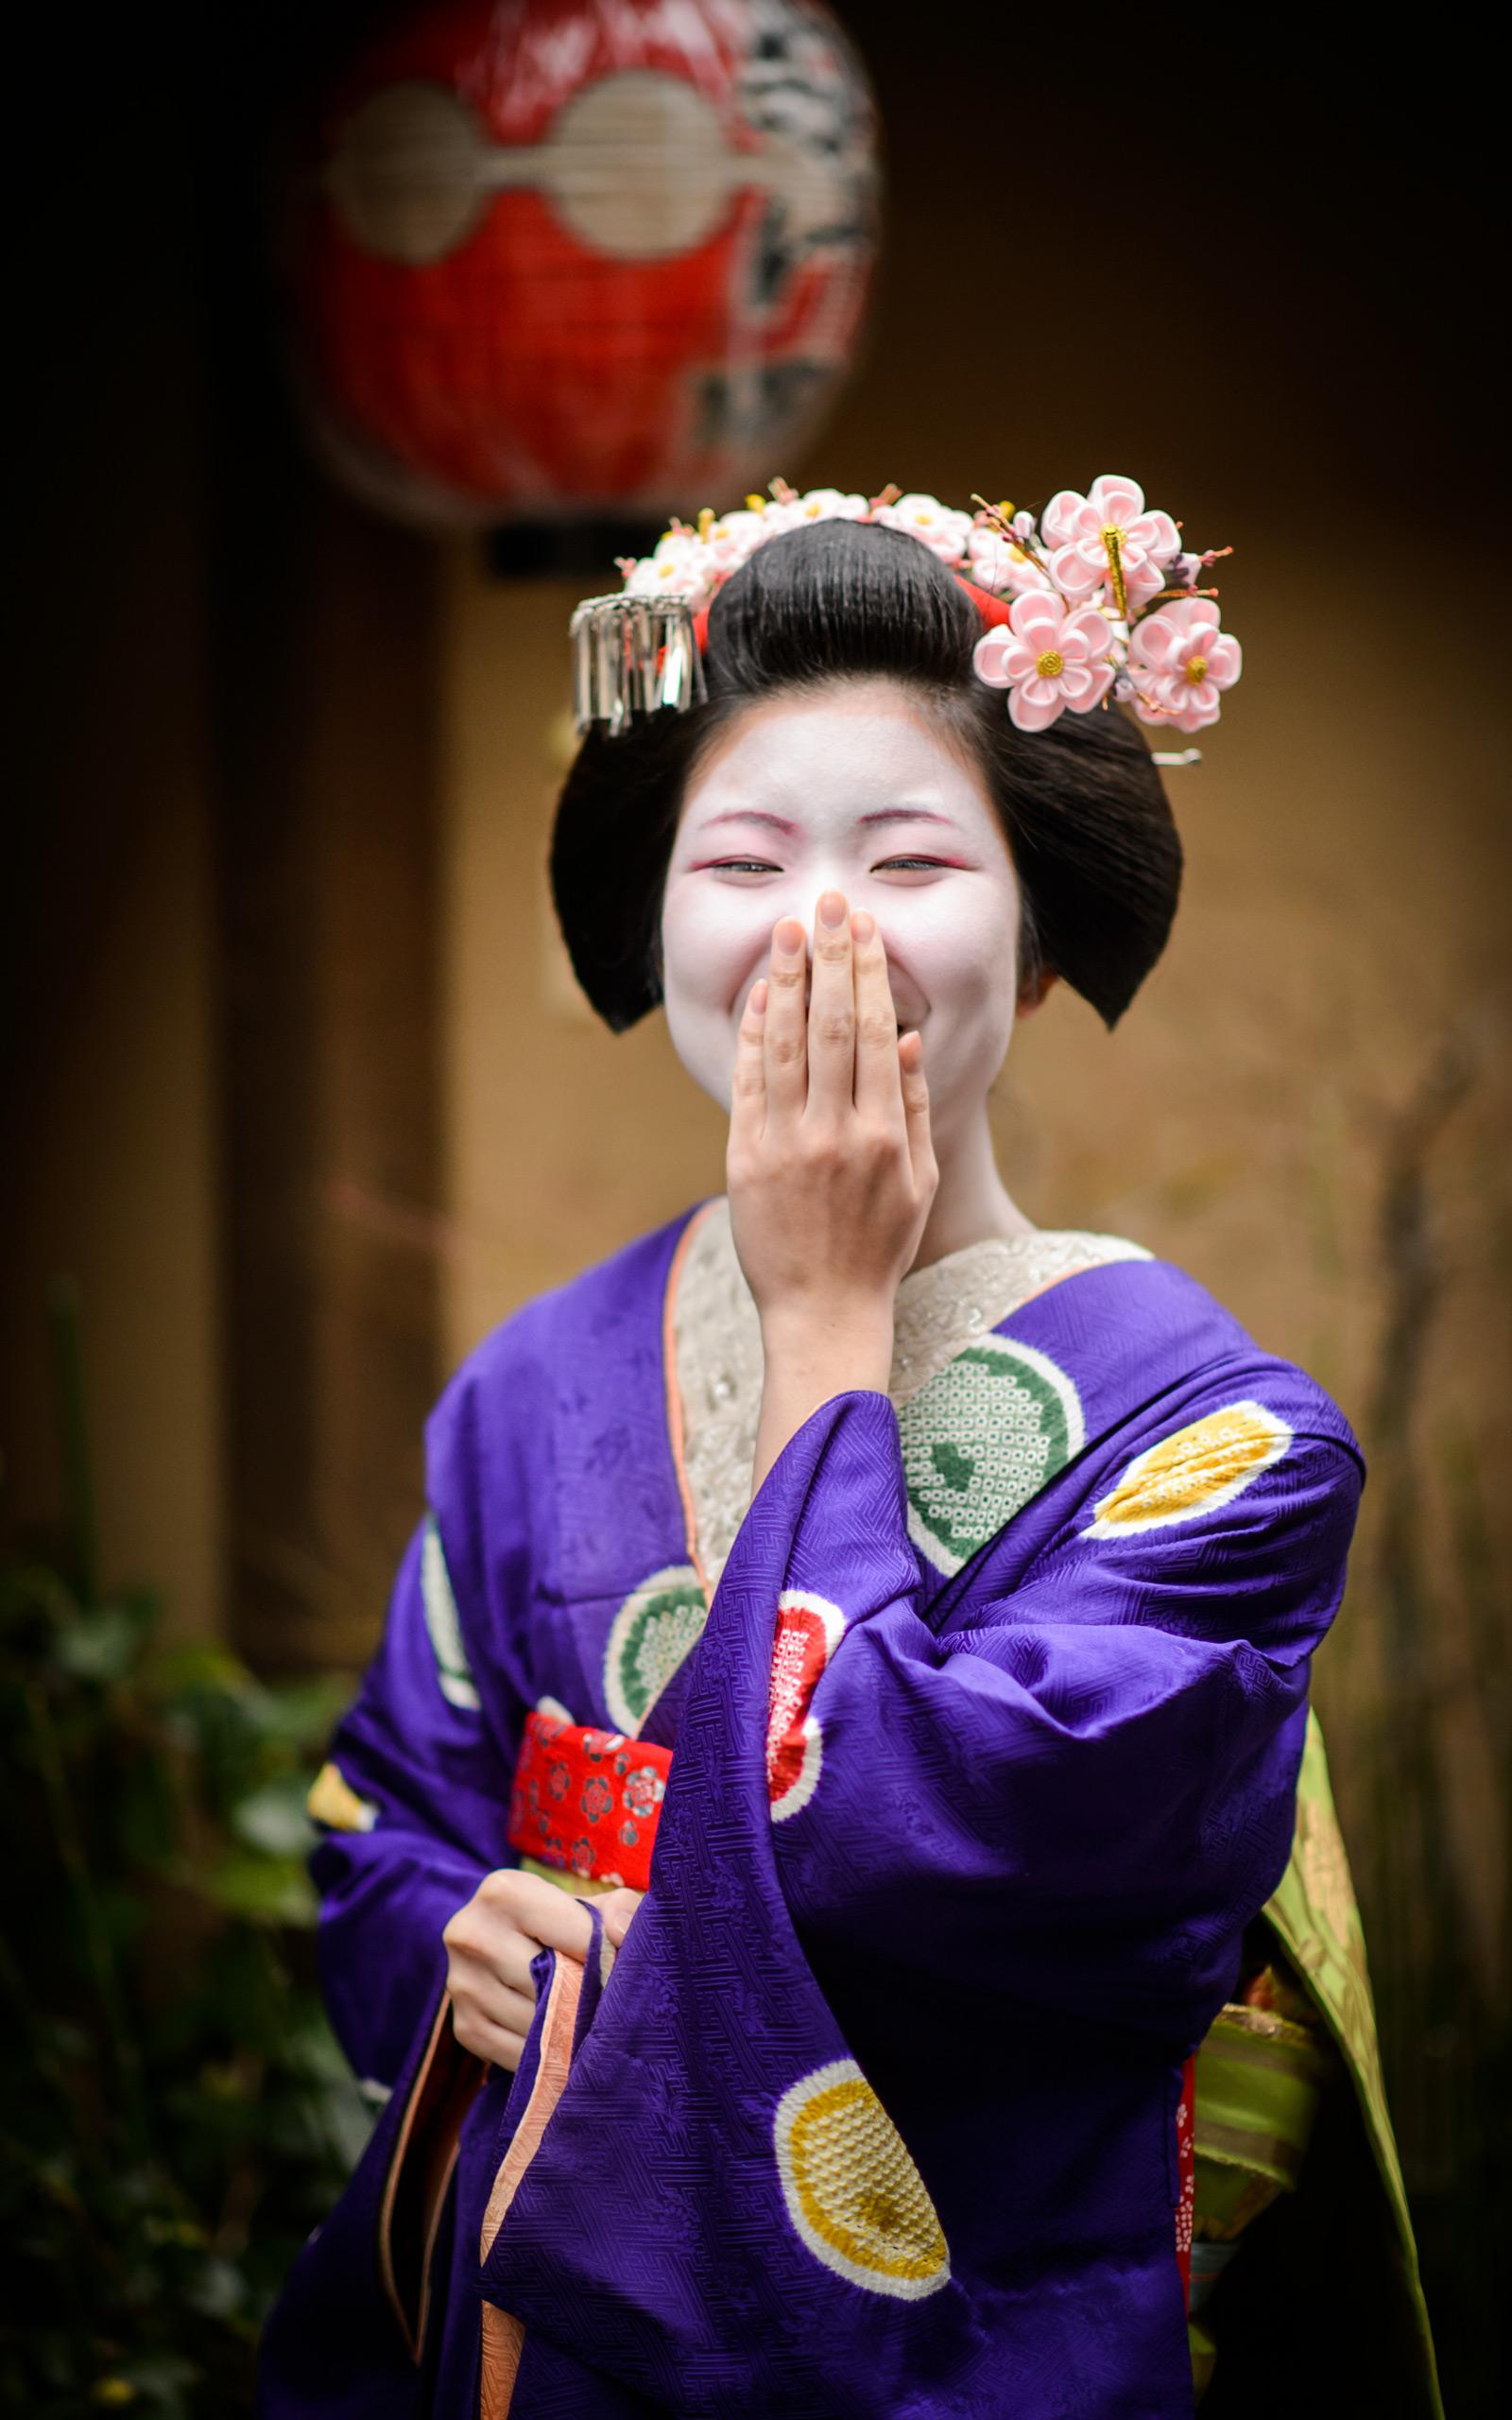 Jeffrey Friedl's Blog » An Apprentice-Geisha Photoshoot ...